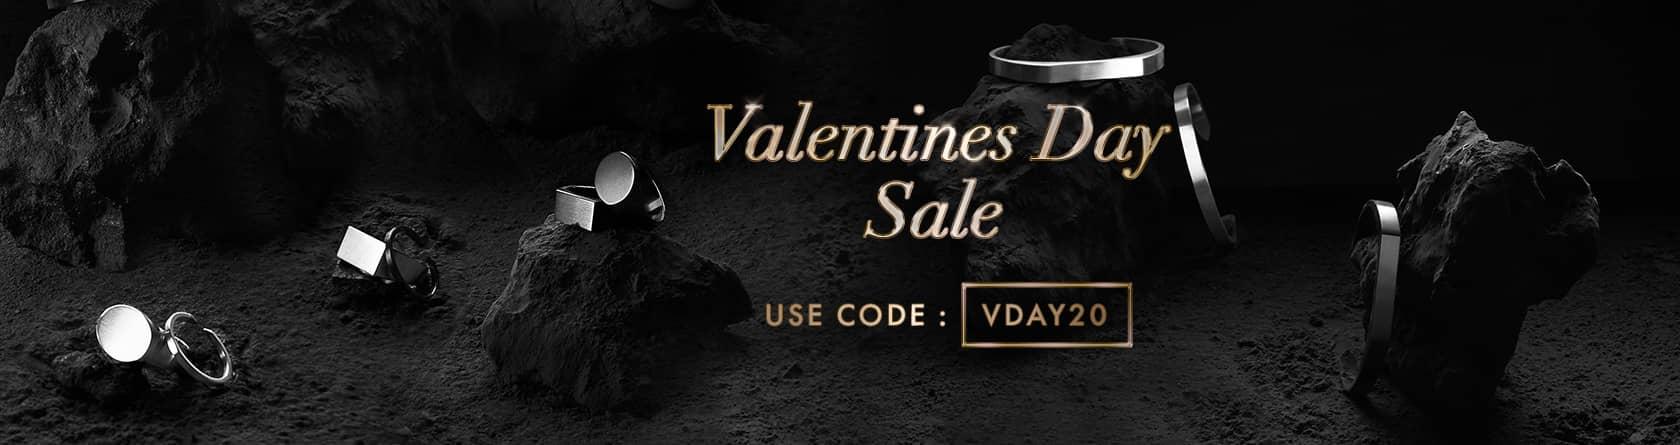 Valentine's Day Sale: Use Code: VDAY20